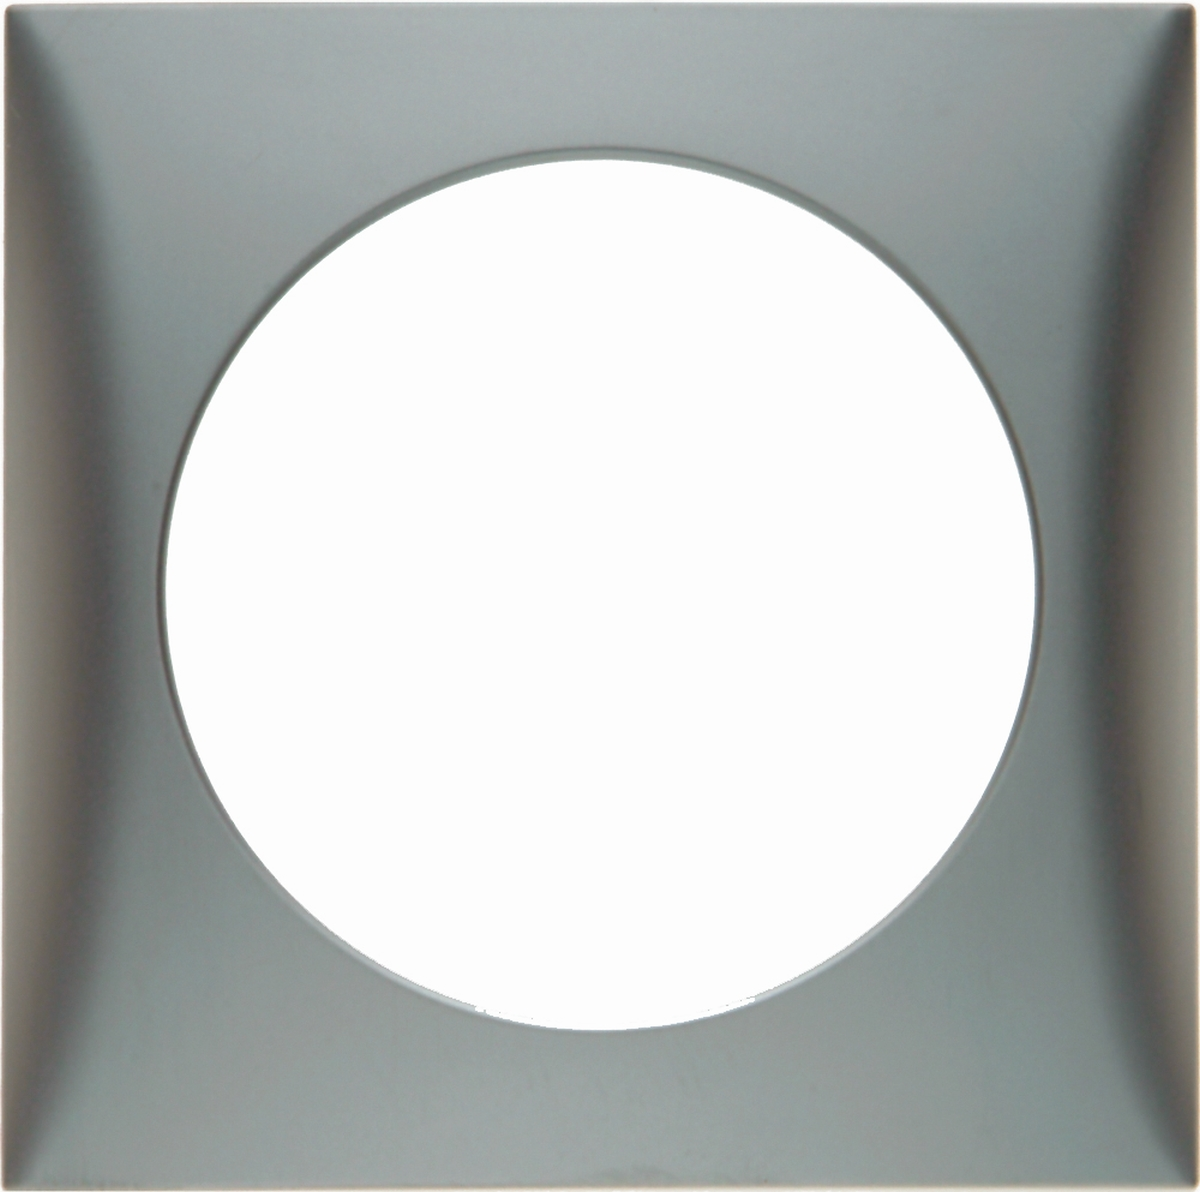 Berker Rahmen 1-fach INTEGRO chrom